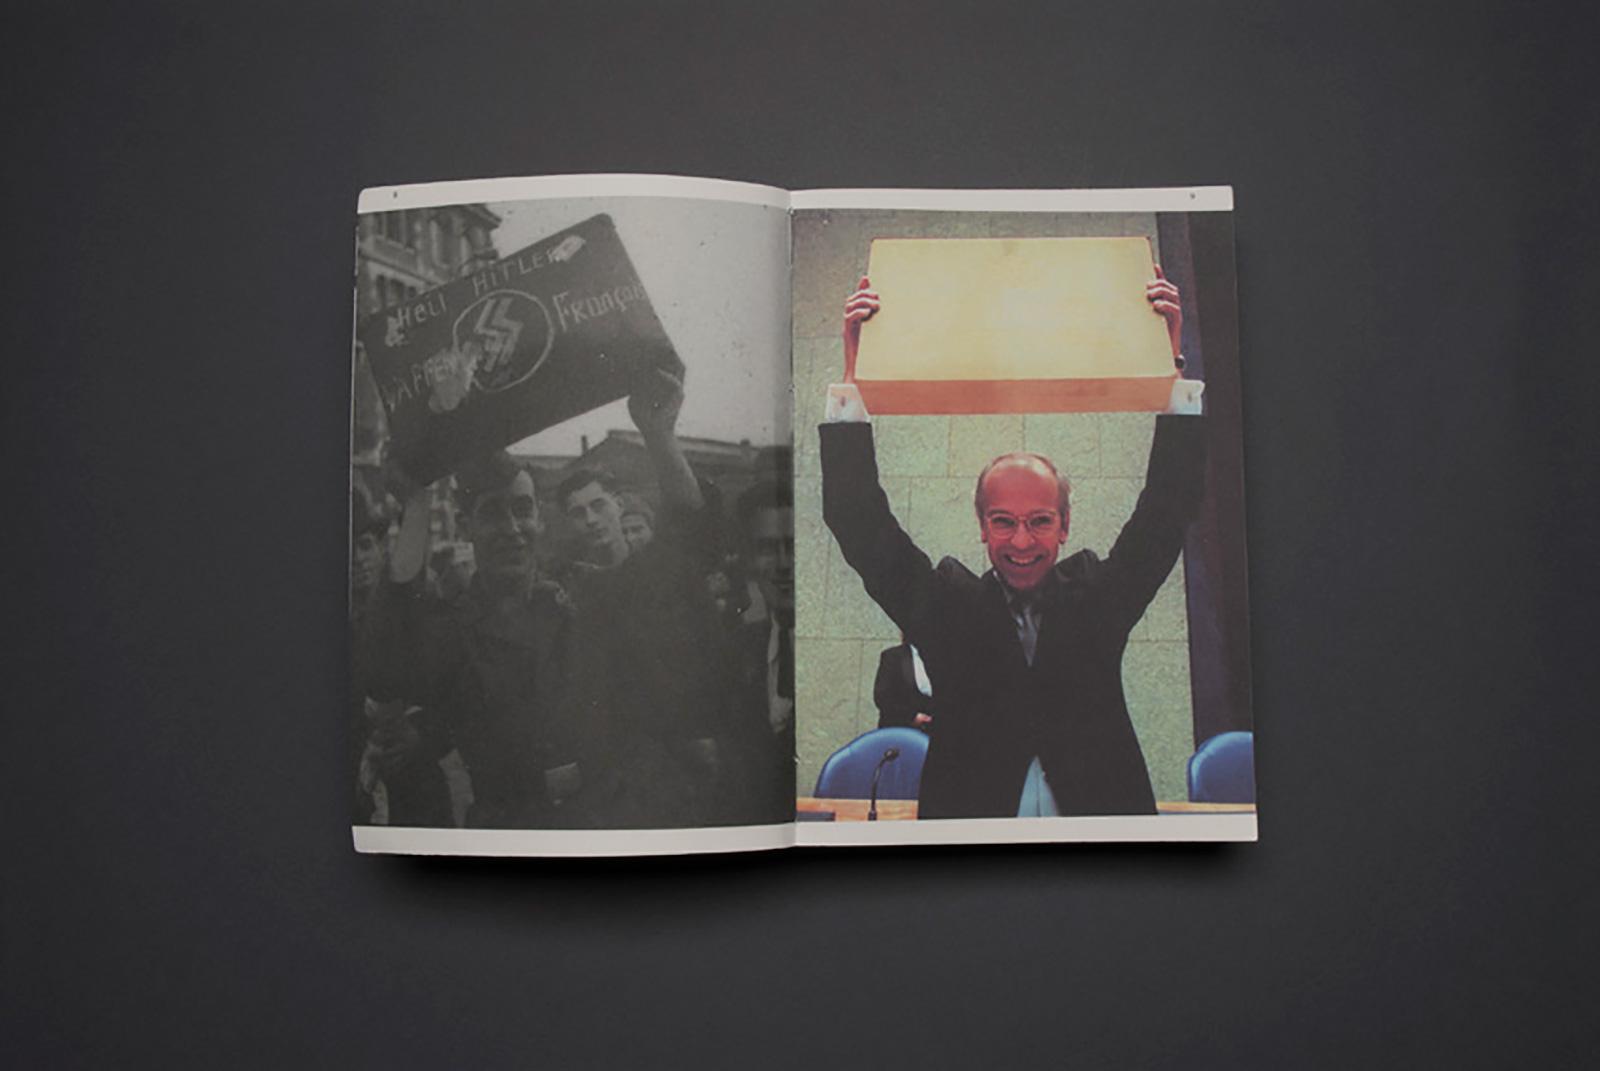 whats-inside-the-koffer-book-wilco-monen-03.jpg